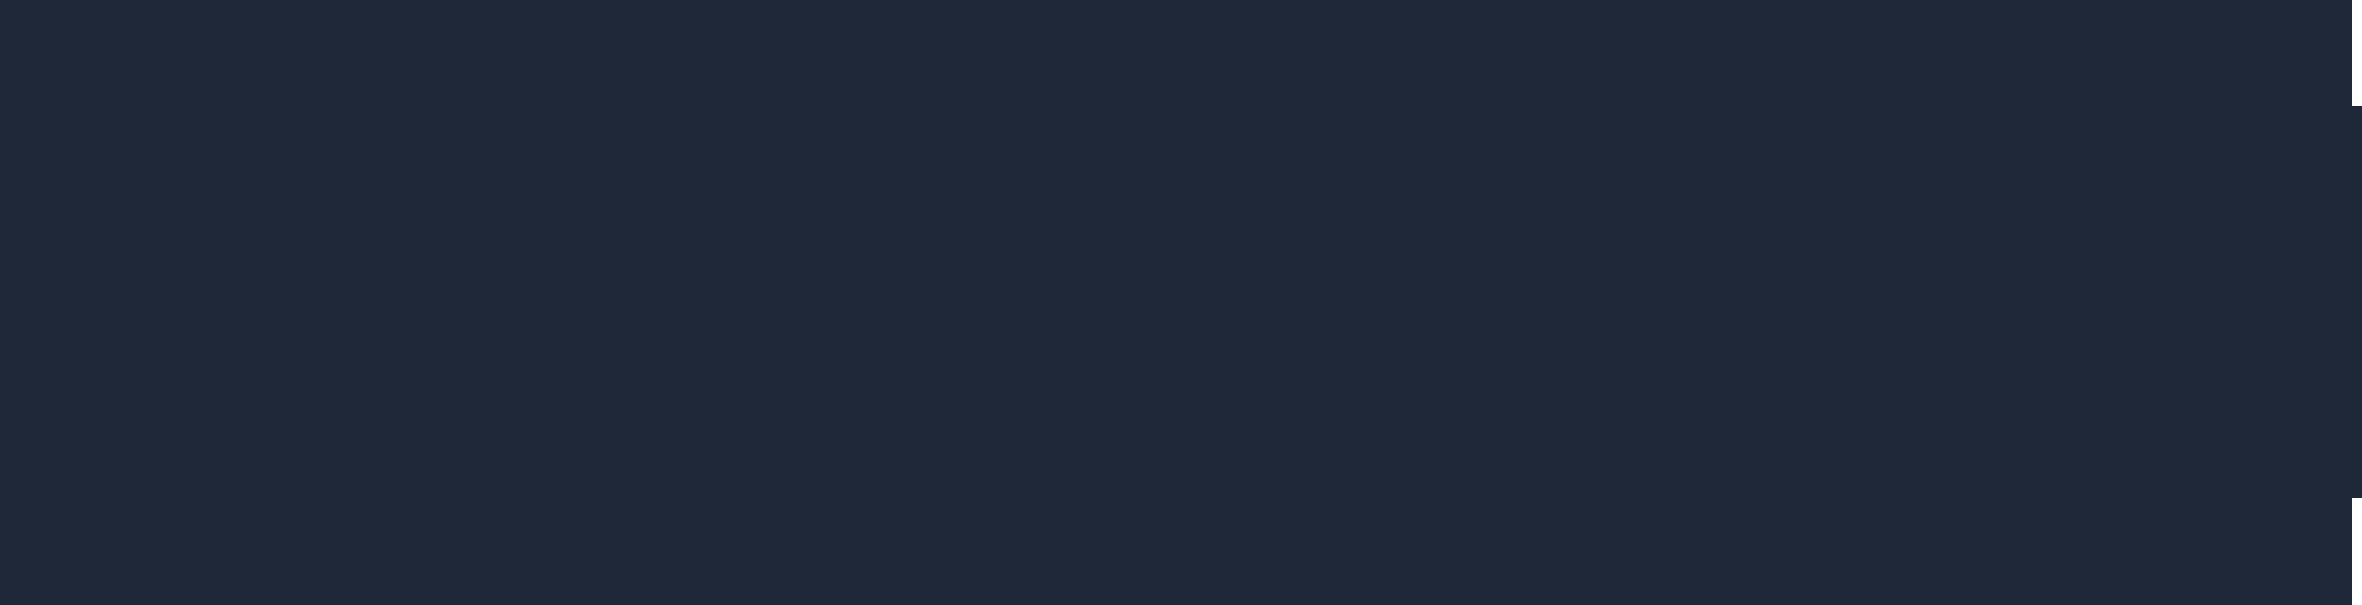 DueDil-Logo-Navy